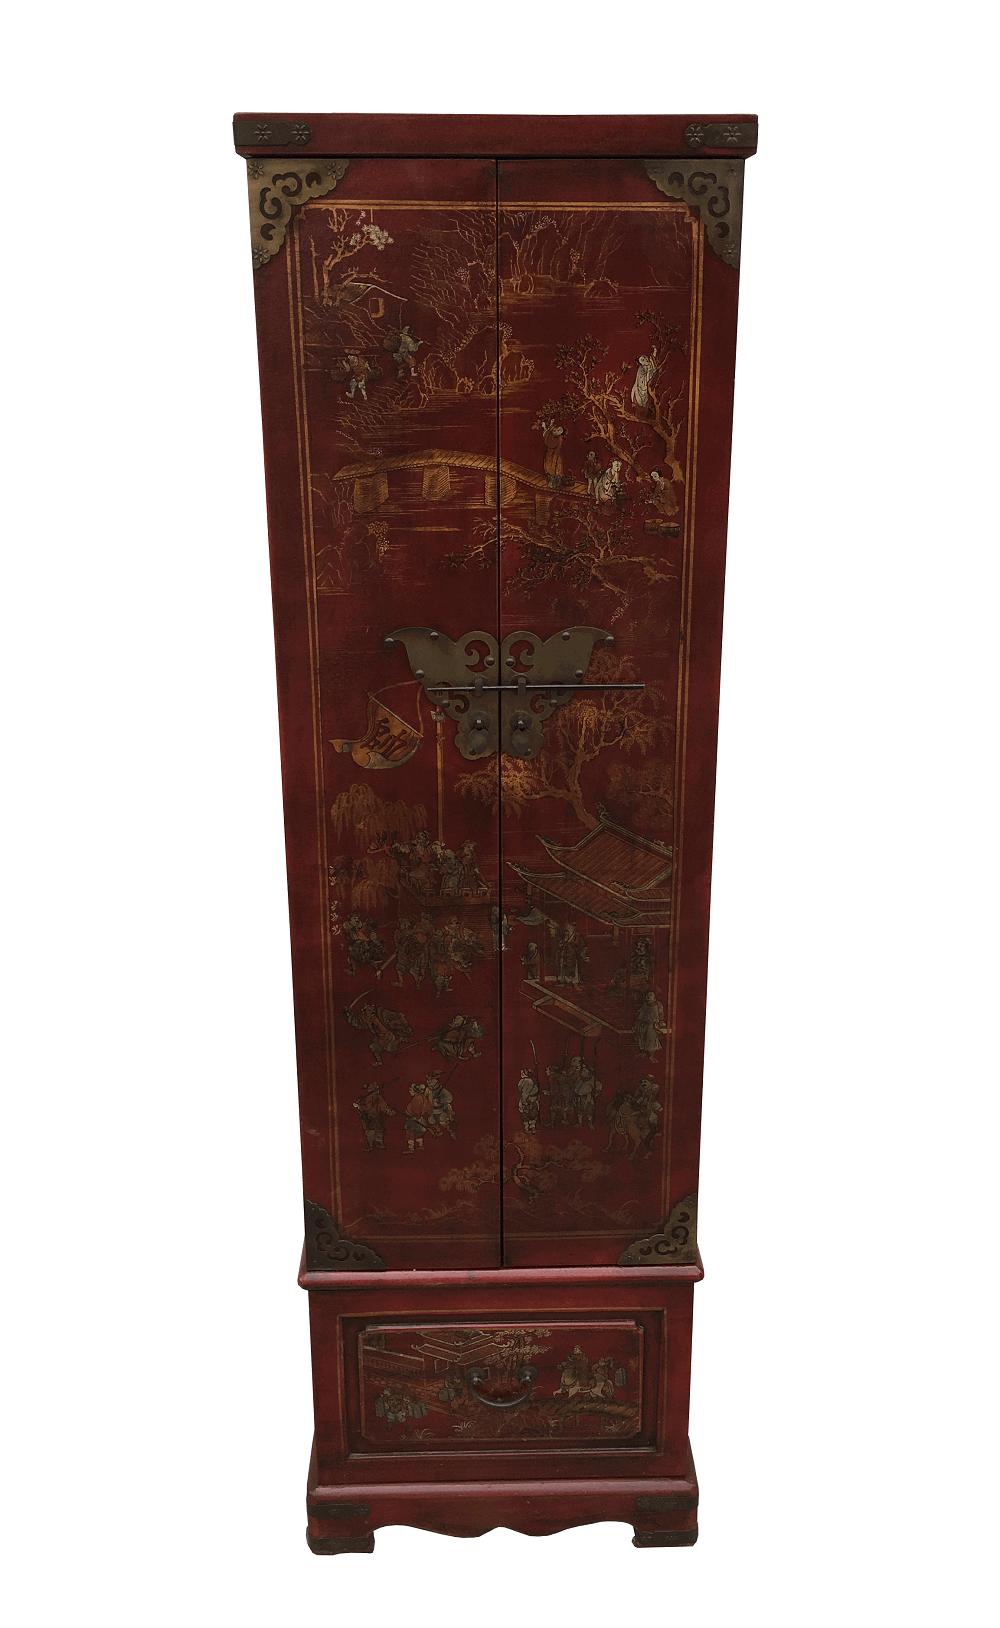 Espetacular Comoda Gaveteiro Chines Porta Joia Antiga